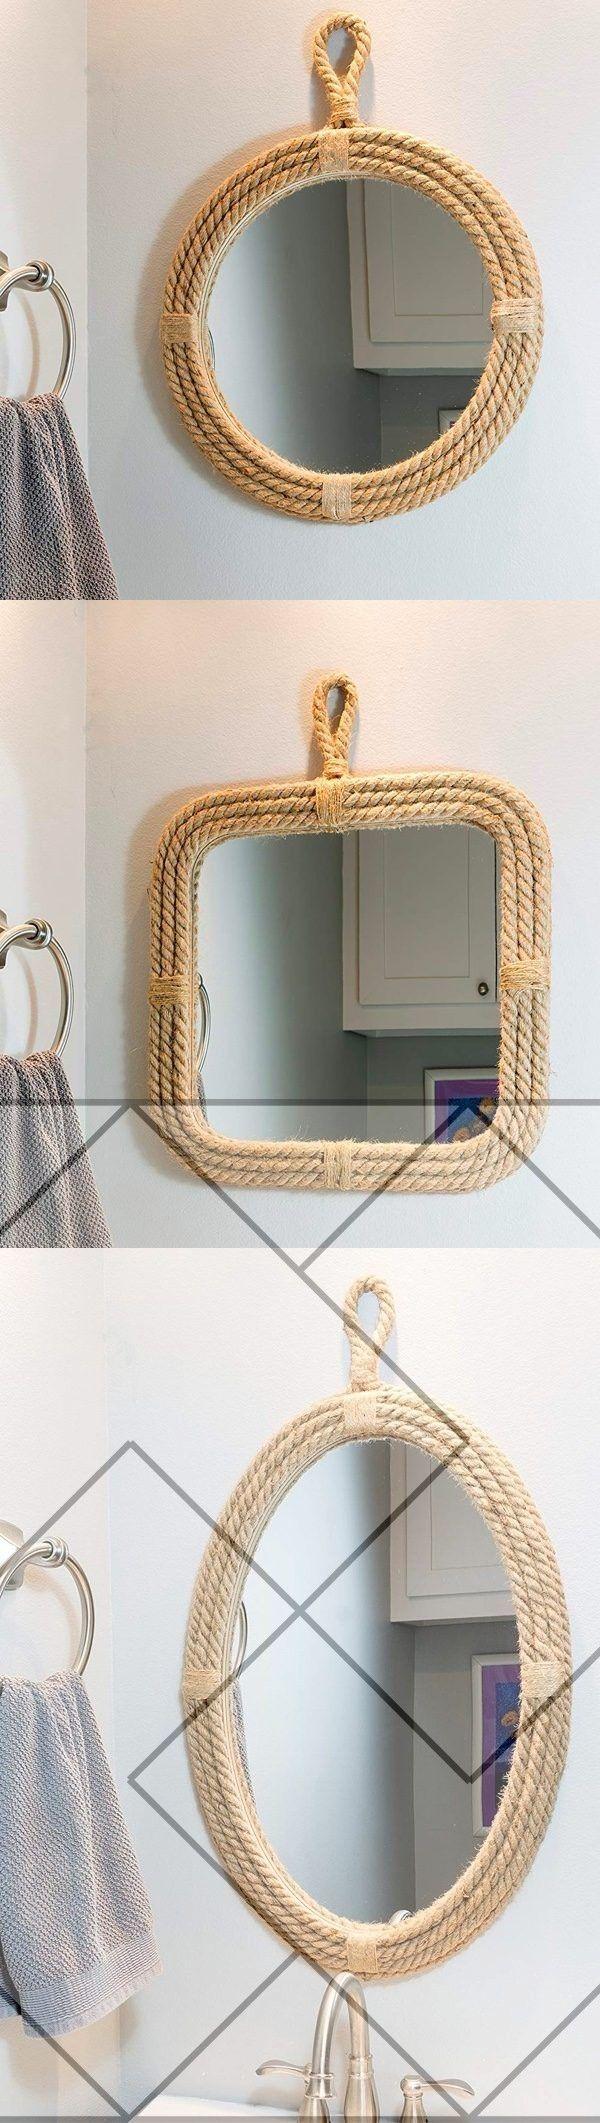 9 eye opening ideas large wall mirror medicine cabinets decorative rh pinterest com